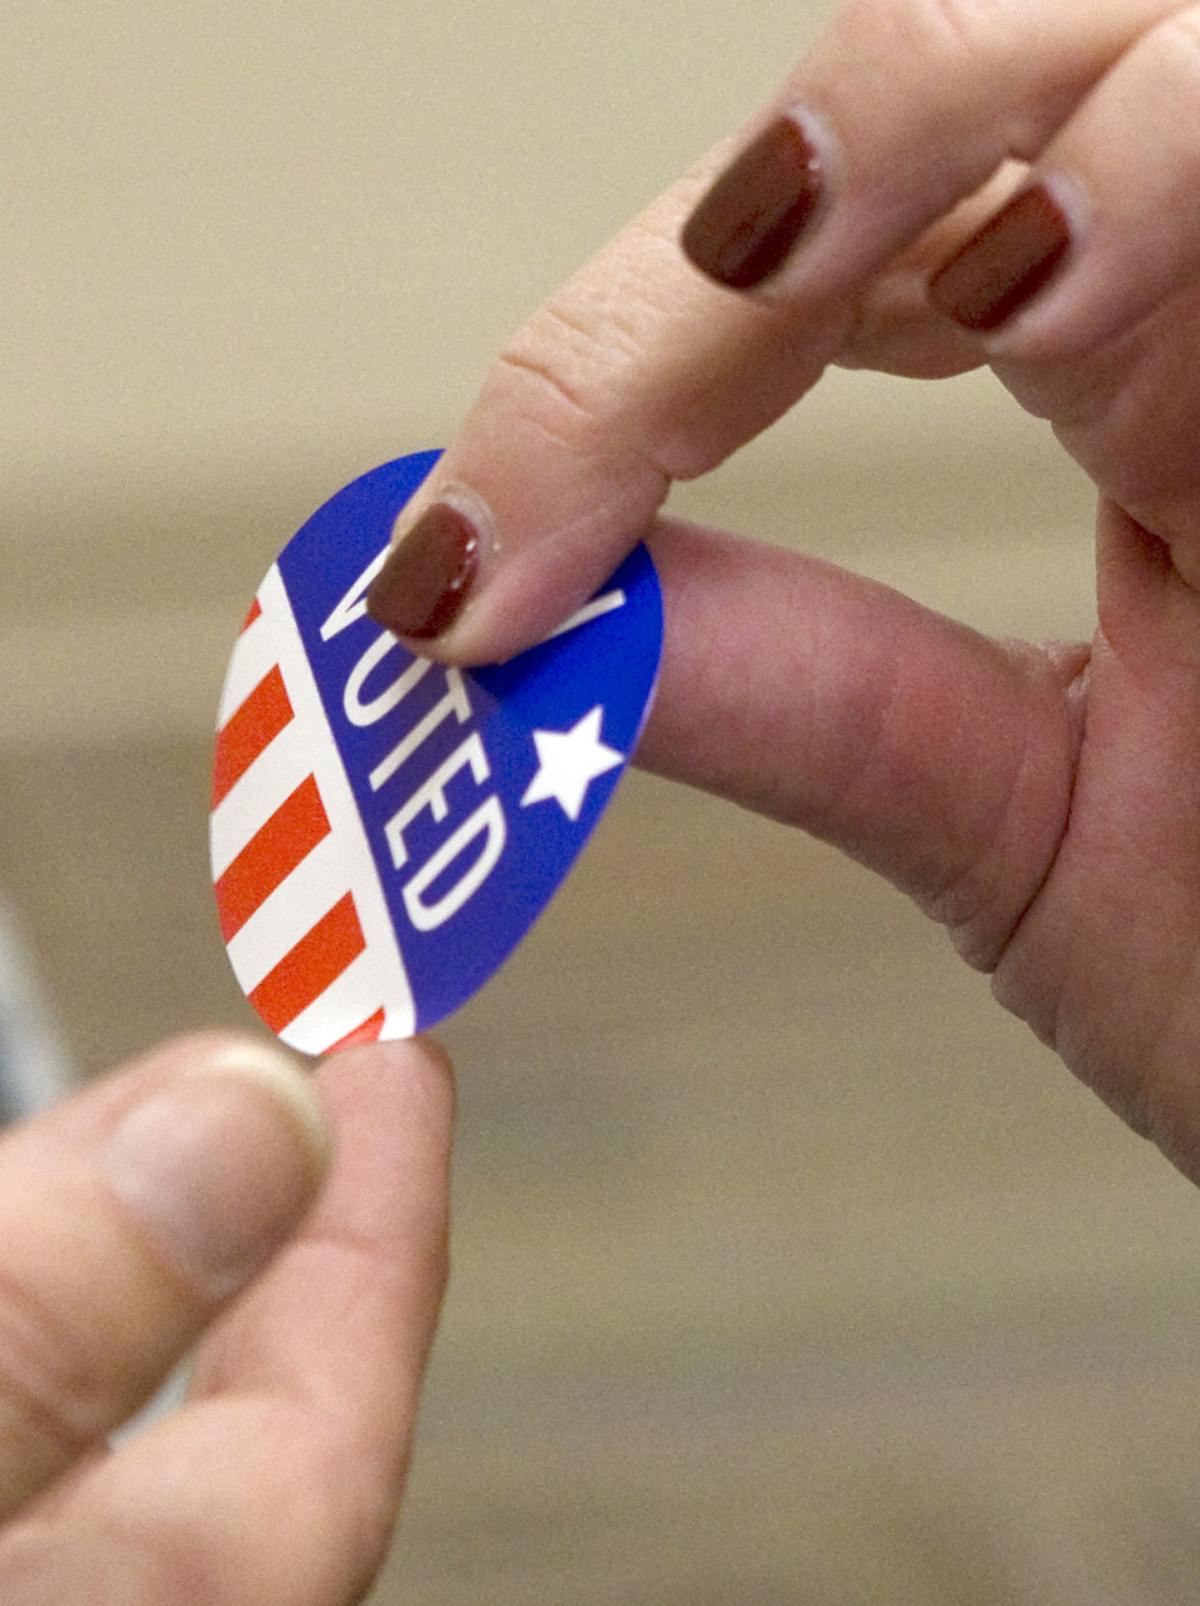 hr votingpolls 110618 p04